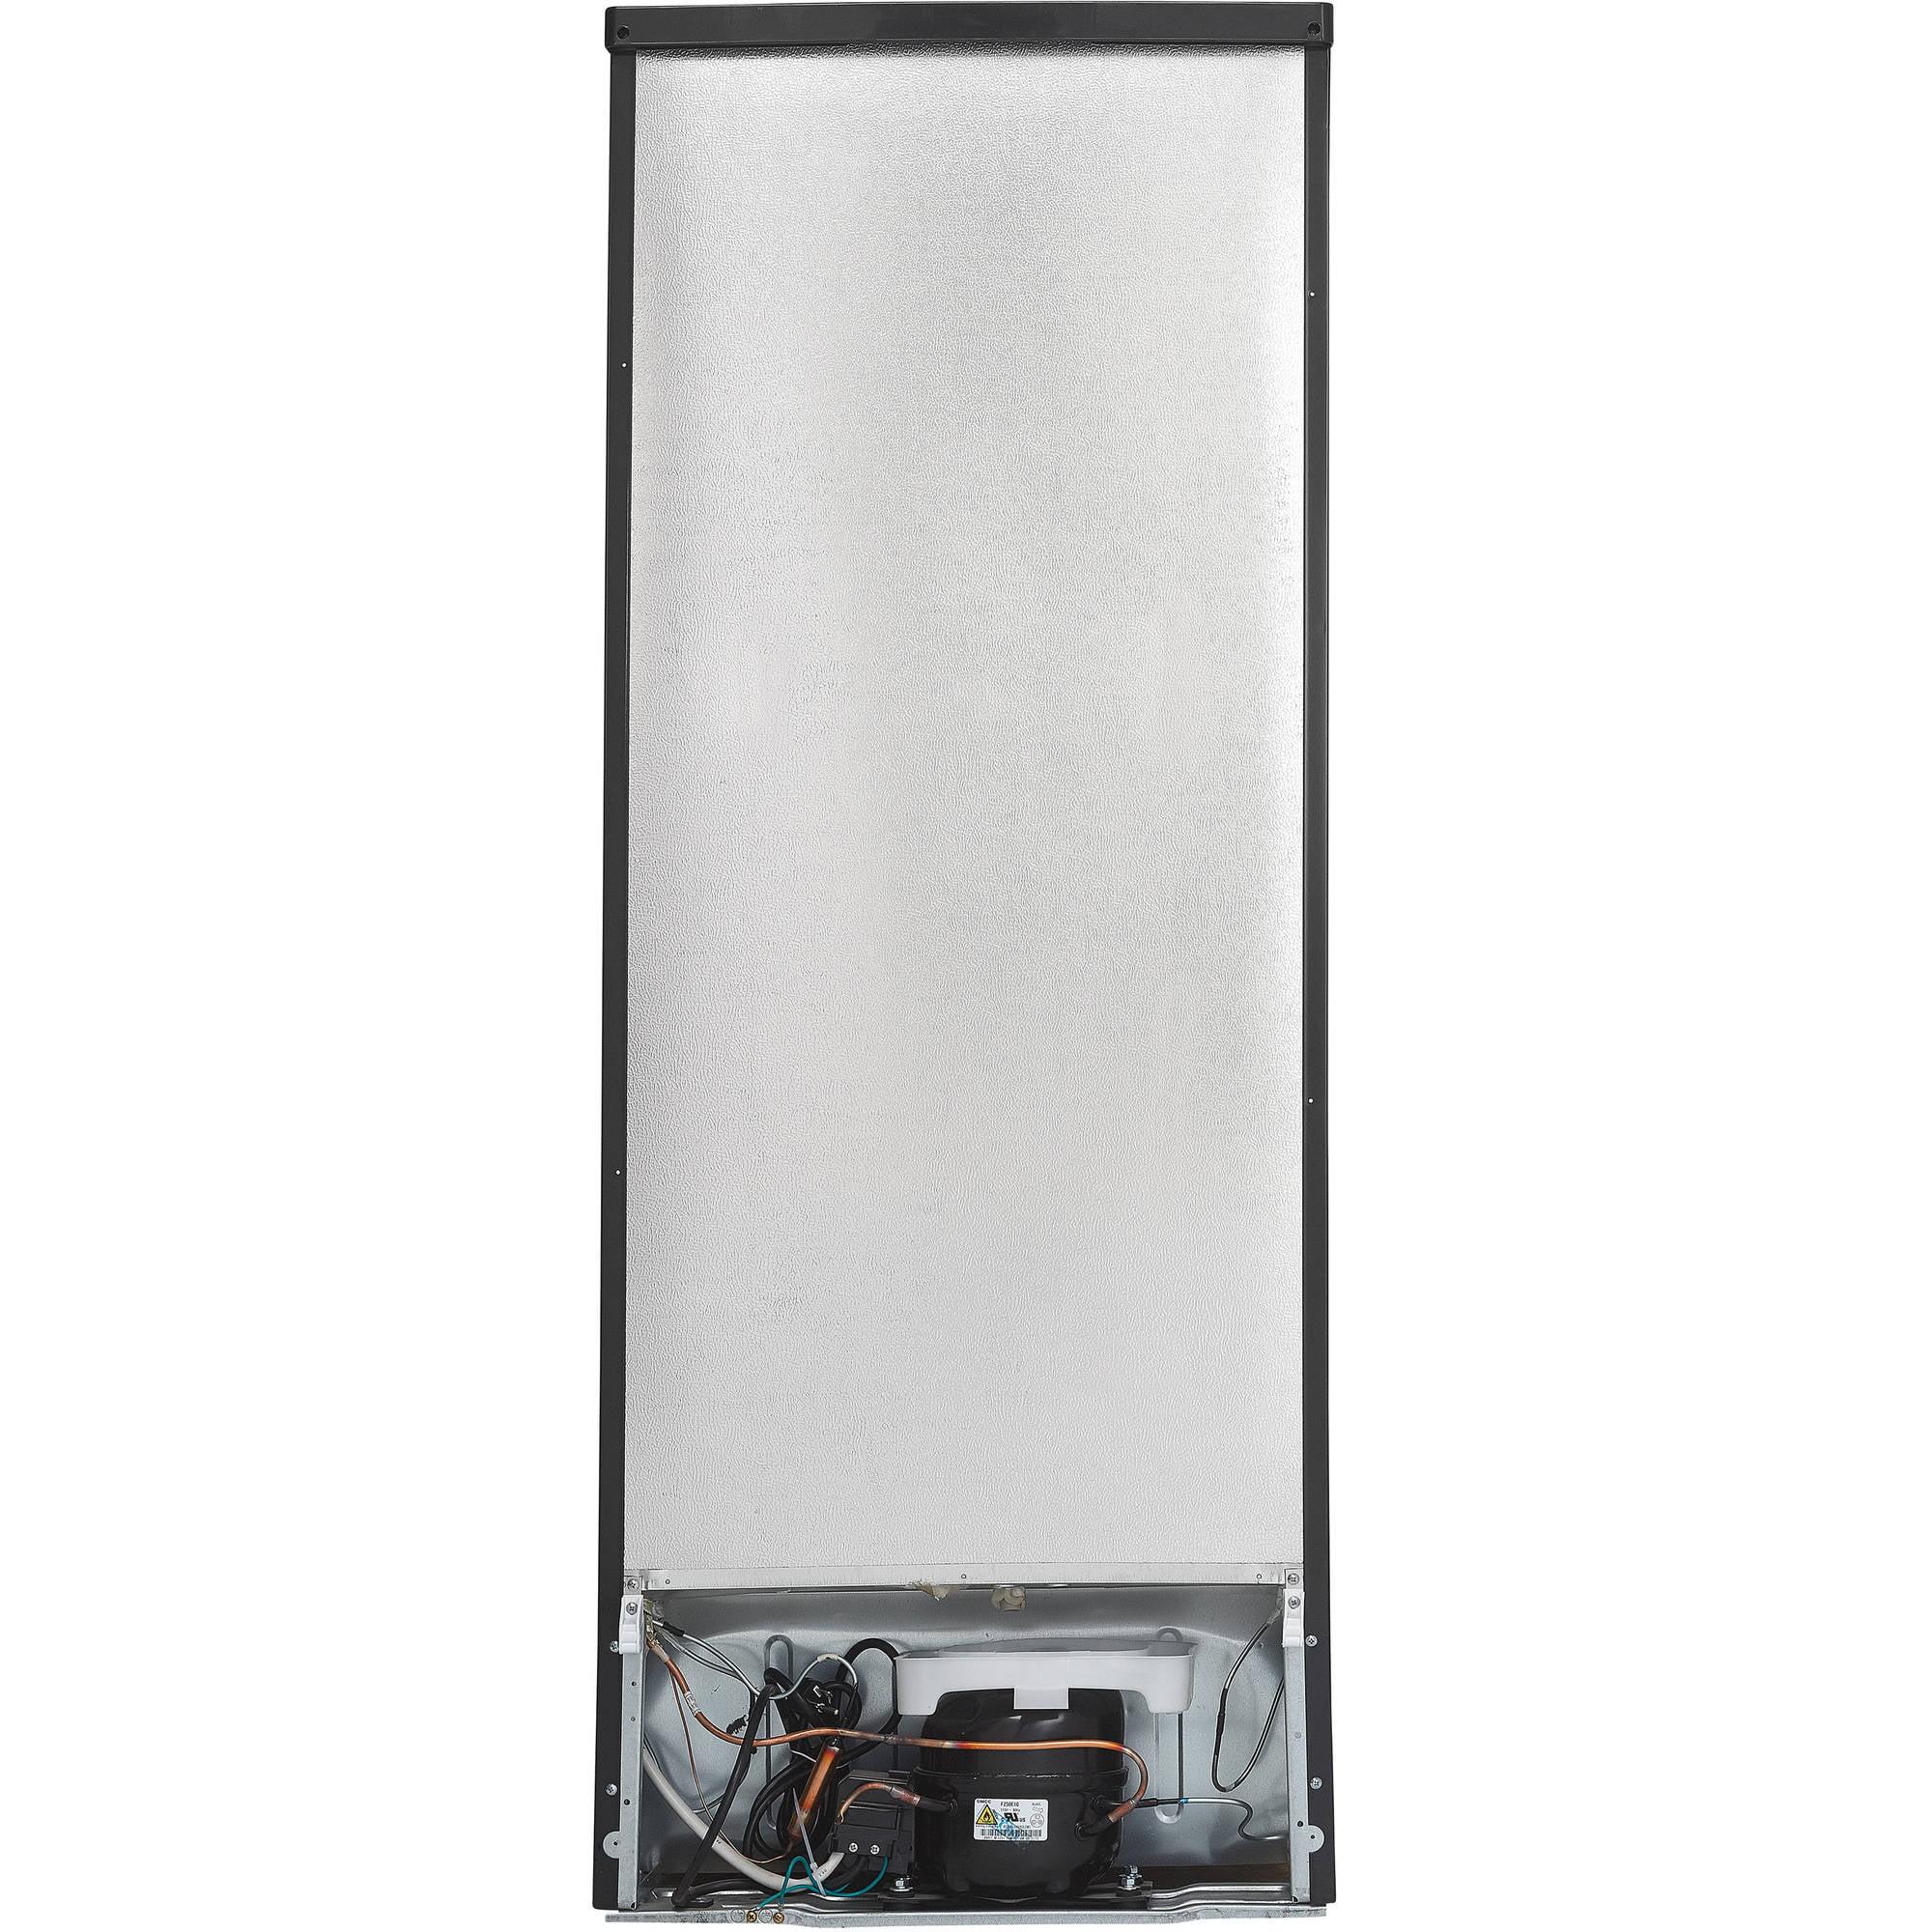 Danby 7.3 cu ft Black Top Mount Refrigerator with Stainless Steel Doors